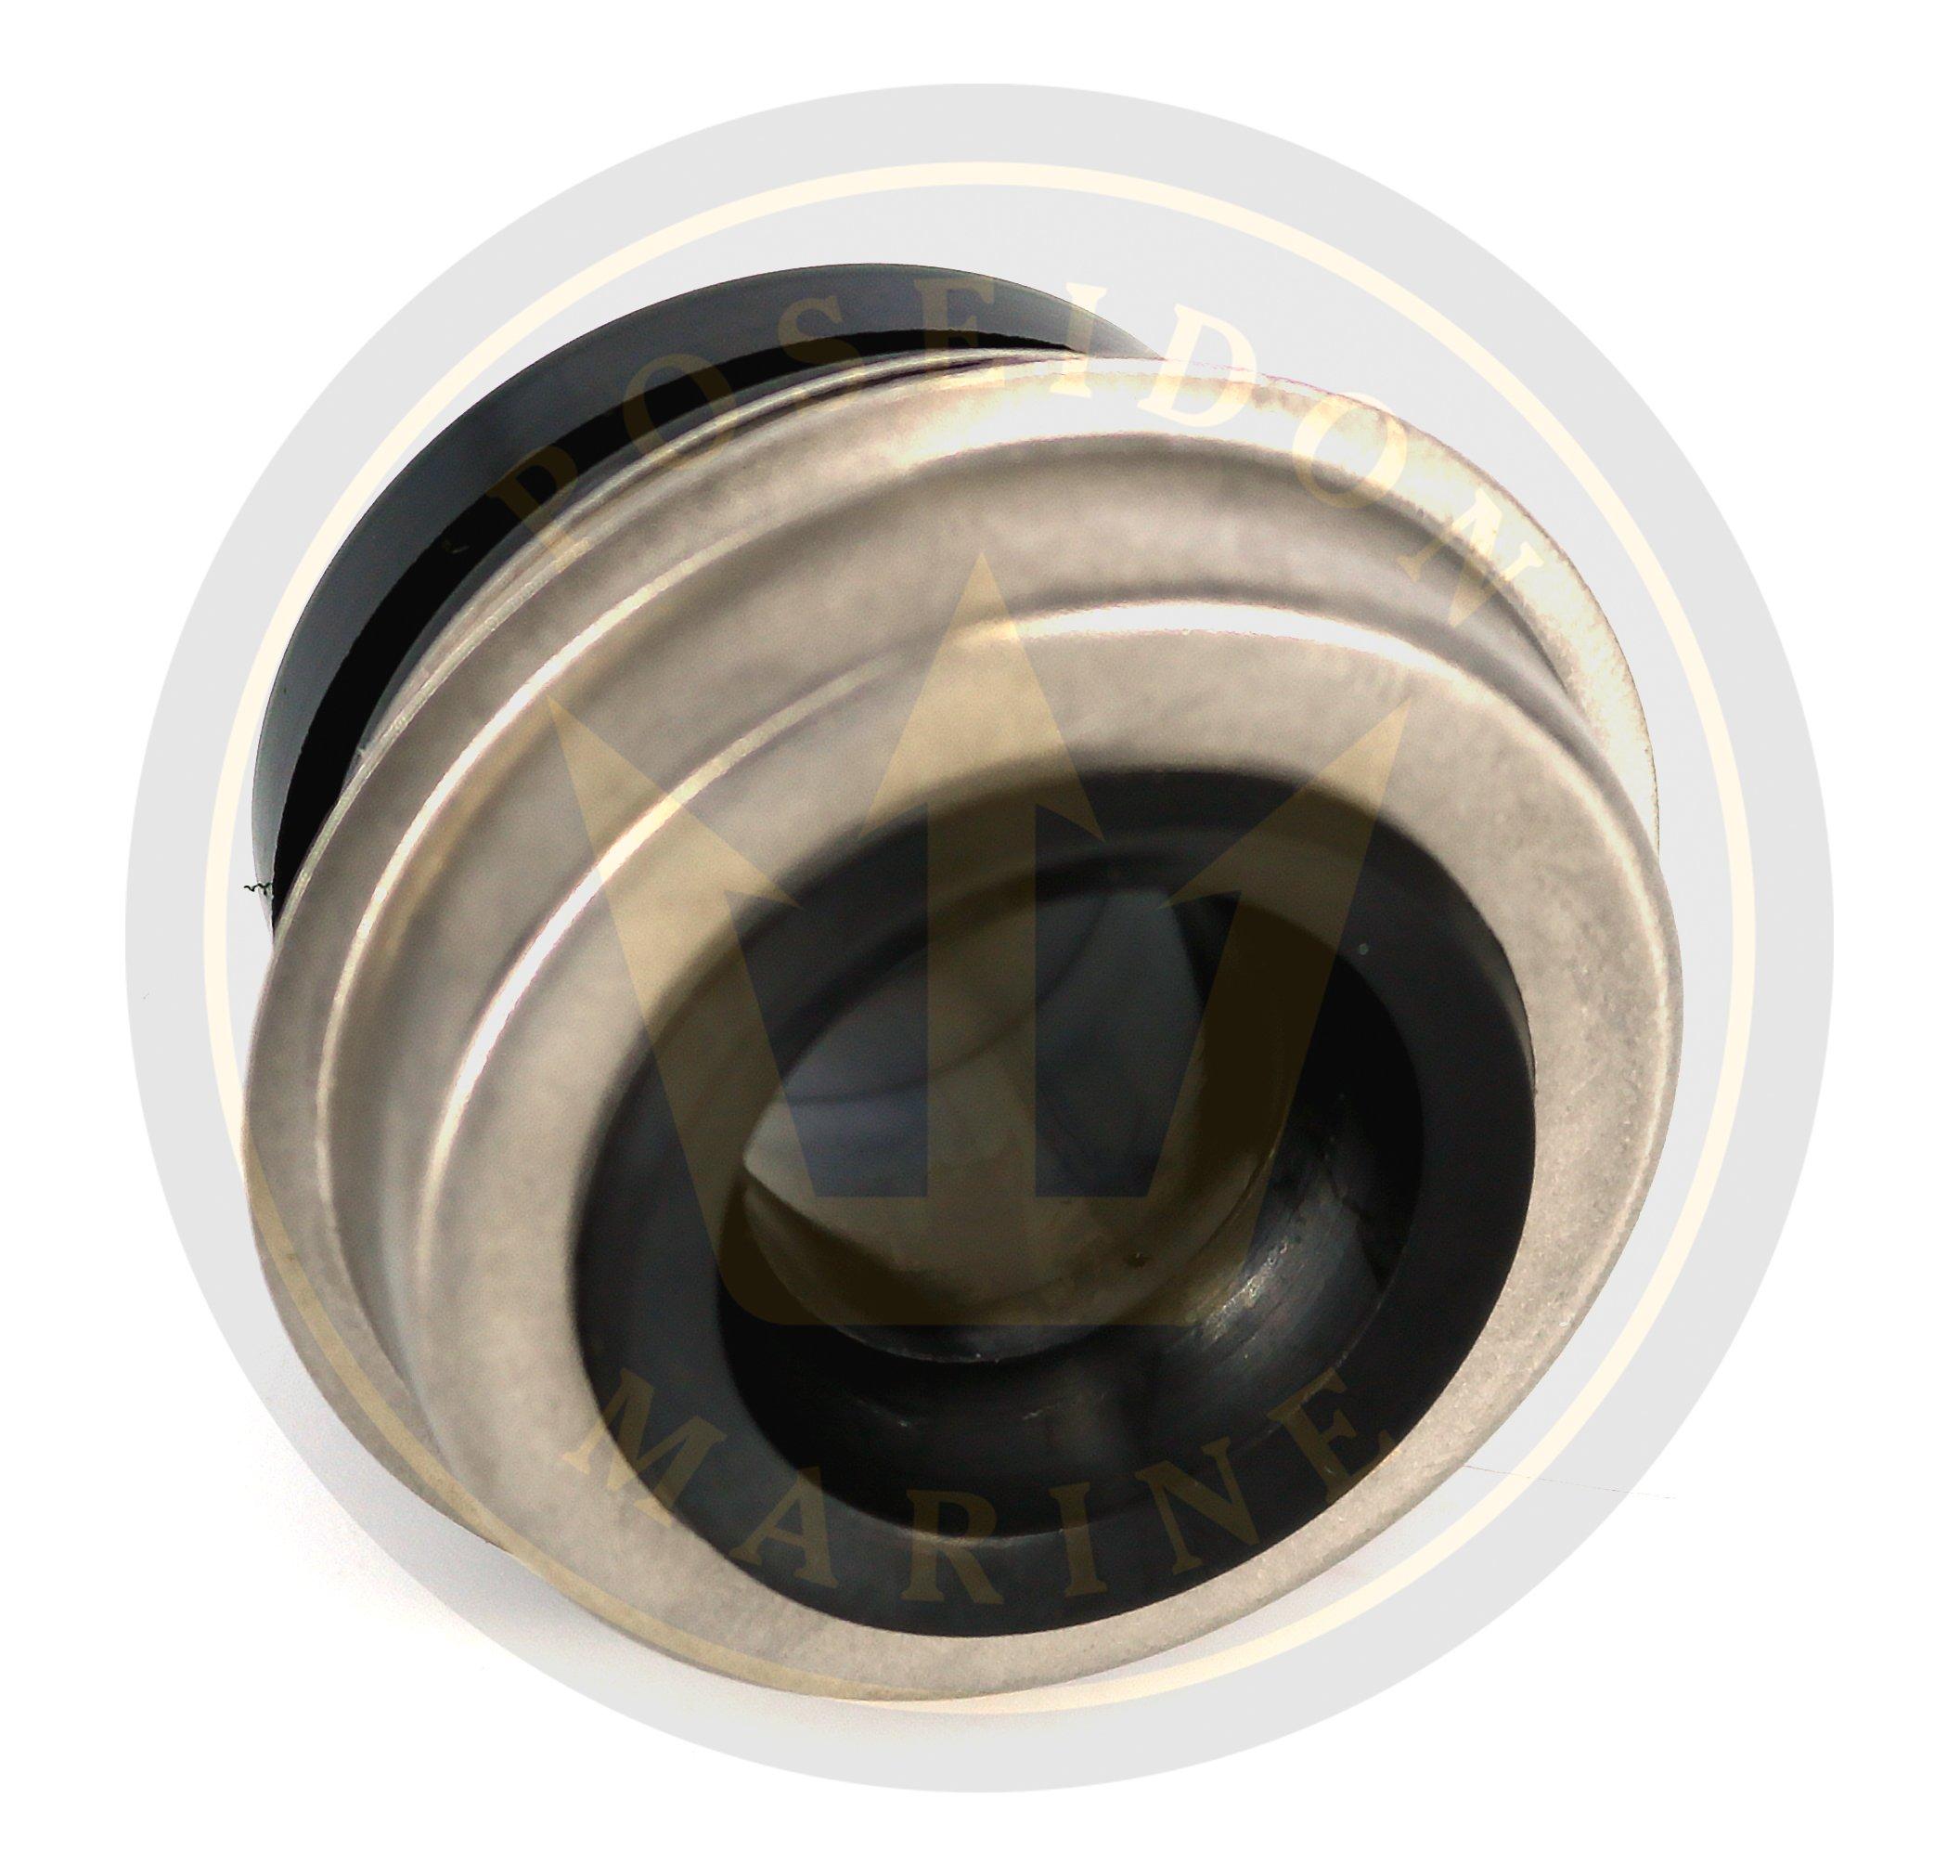 Poseidon Marine Water pump seal for Volvo Penta D4 D6 RO 3583609 pumps 3584062 21380890 3589907